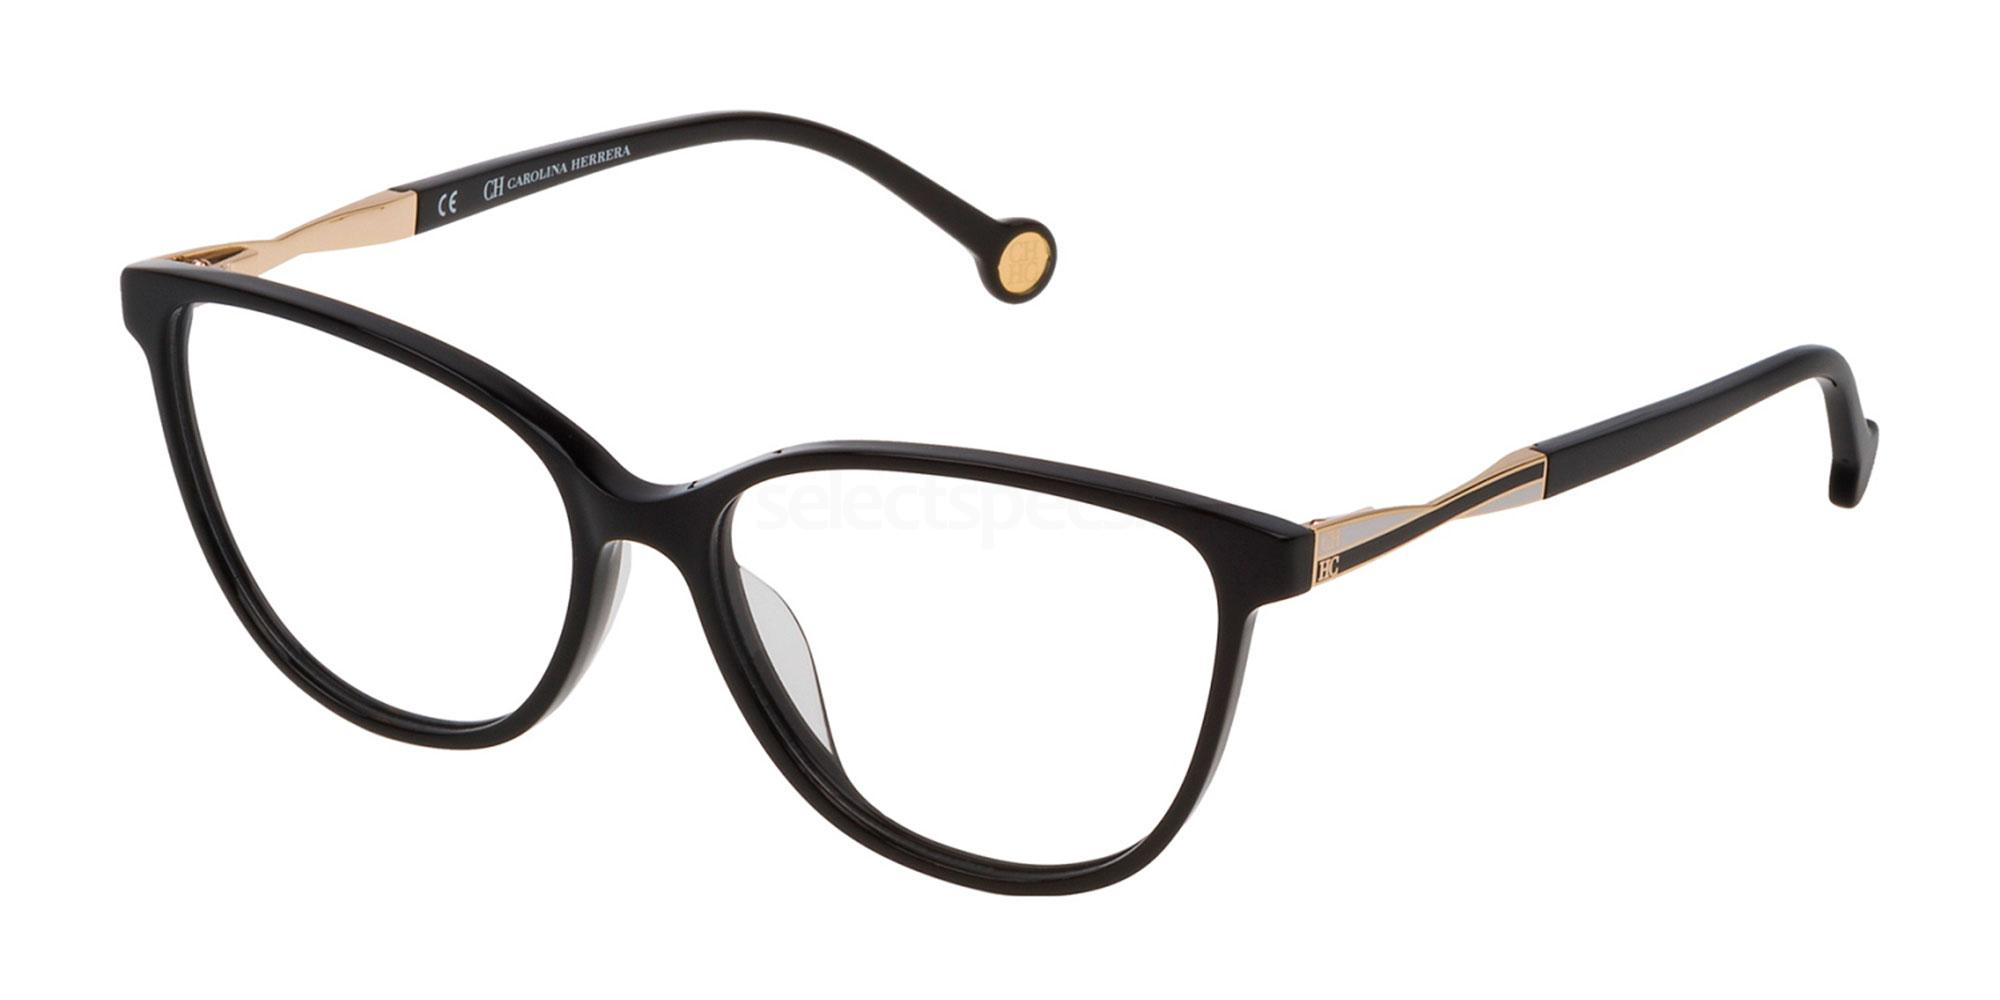 0700 VHE780 Glasses, CH Carolina Herrera